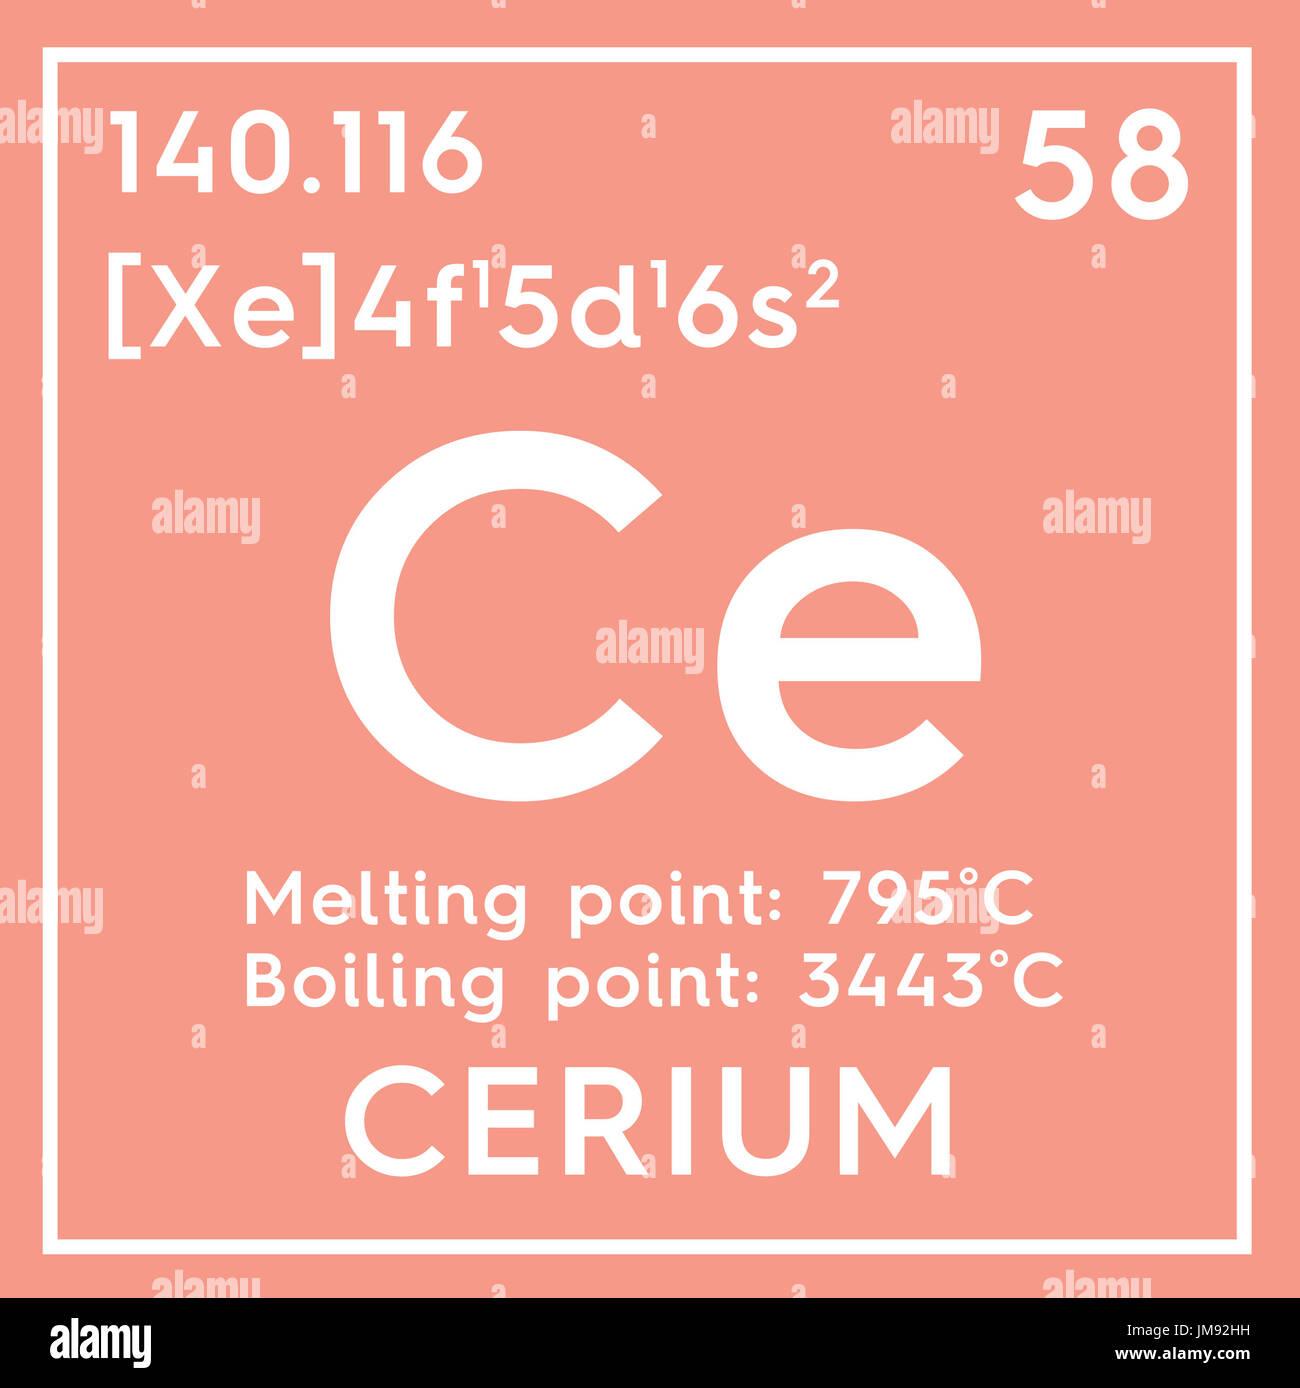 Ce element periodic table gallery periodic table images periodic table ce images periodic table images ce element periodic table images periodic table images cerium gamestrikefo Gallery